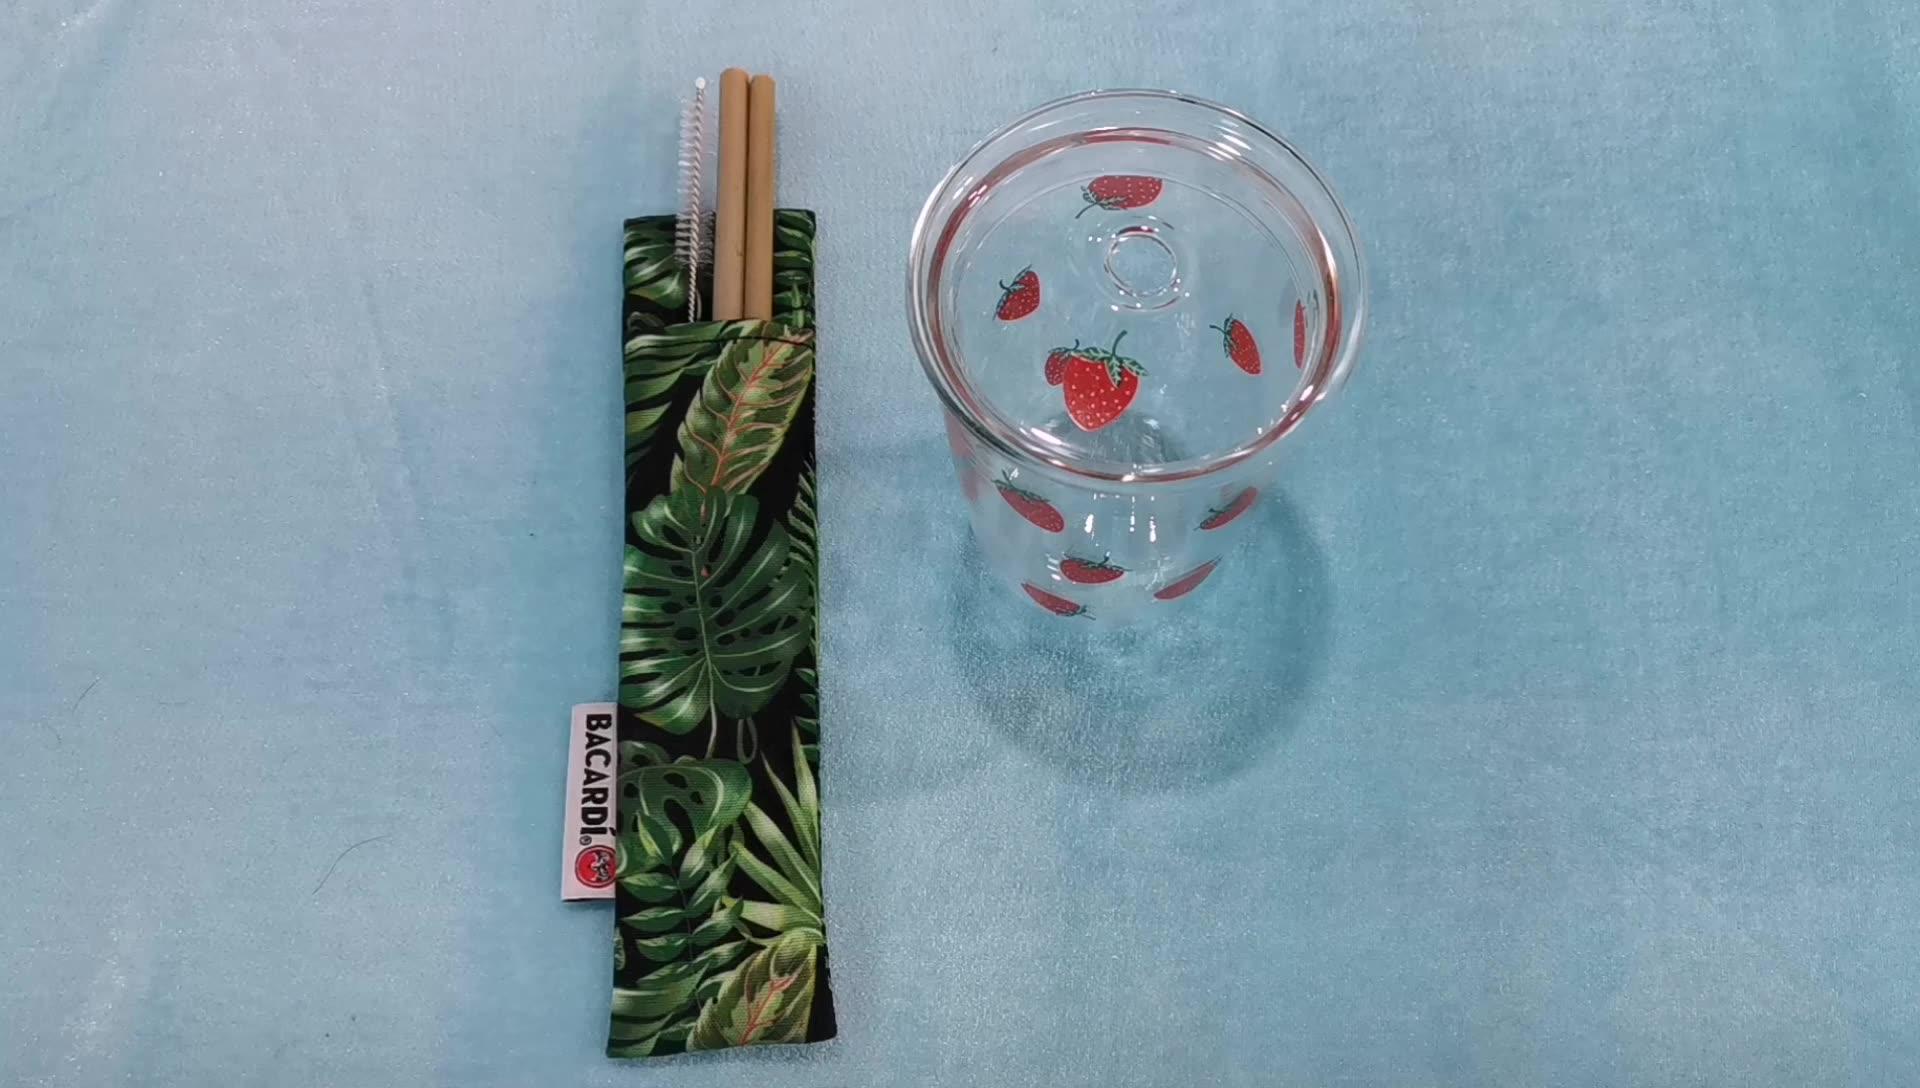 Wholesale bamboo straws with customized logo,bamboo drinking straws,bamboo straws reusable